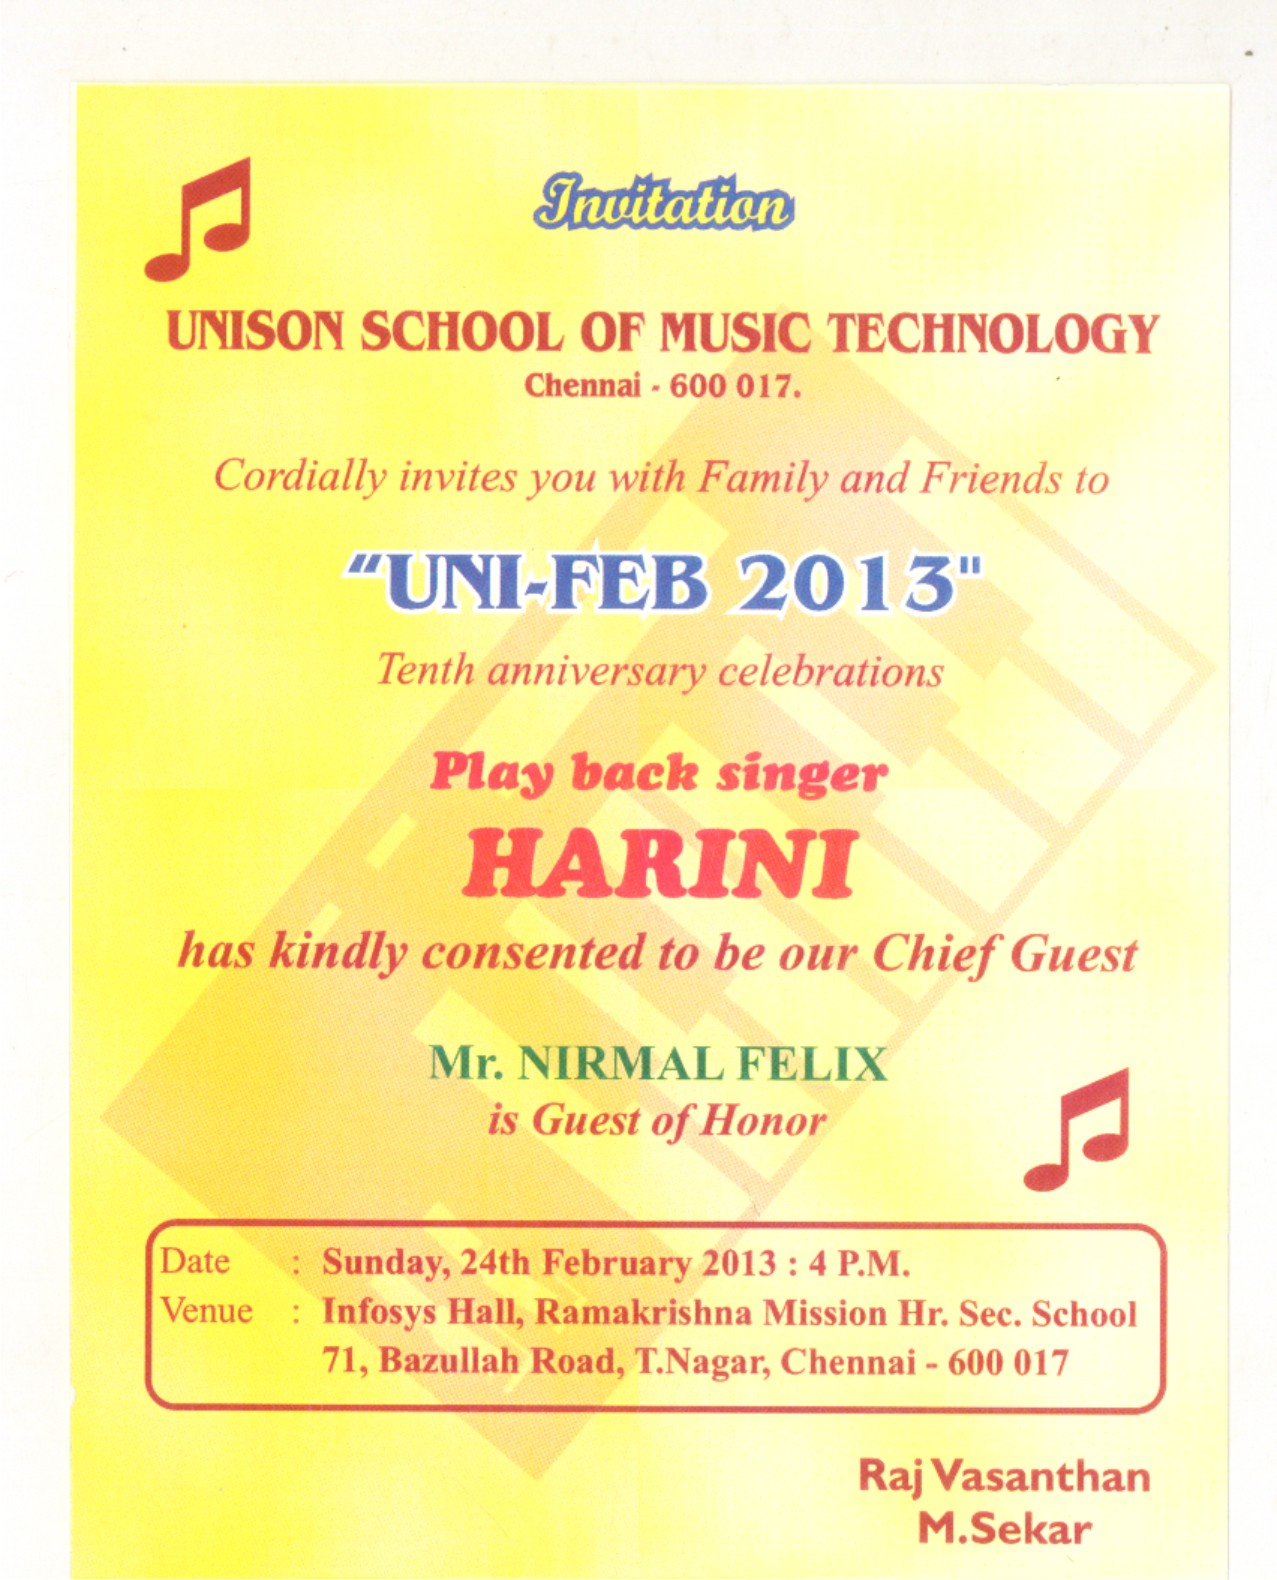 UNISON SCHOOL OF MUSIC COMPOSITION Invitation 10th Anniversary